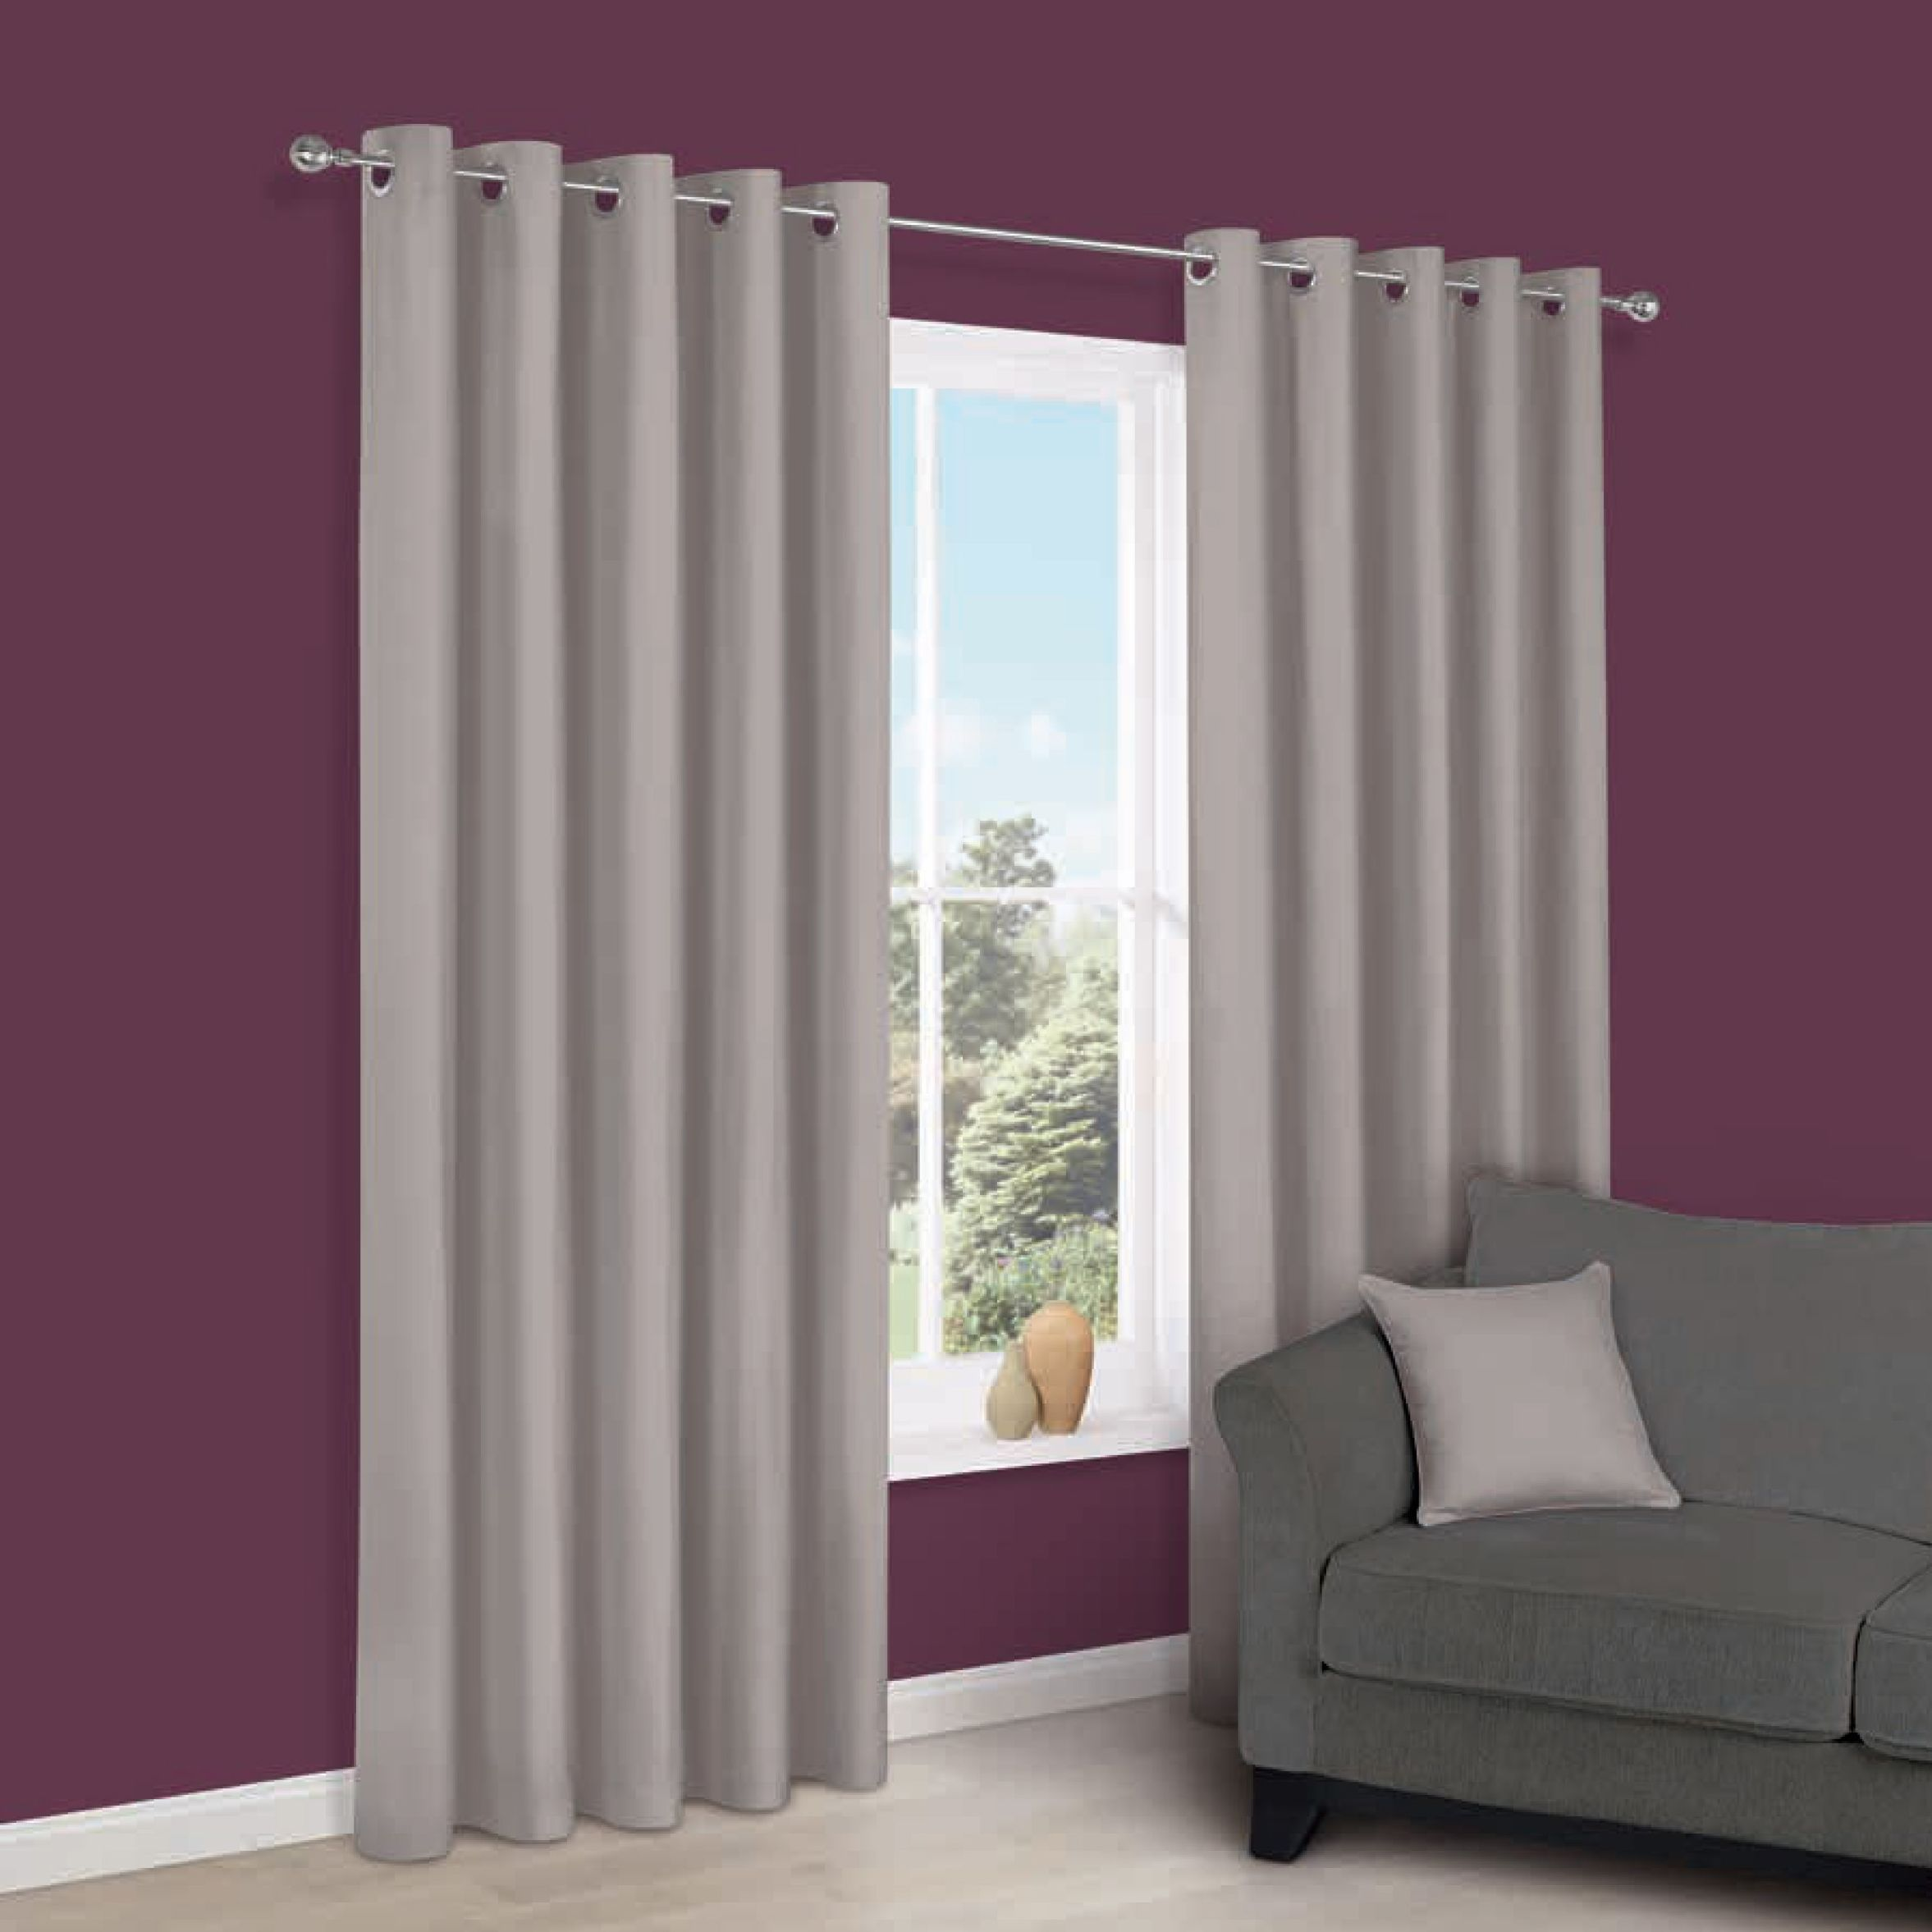 Zen Serenity Plain Eyelet Curtains (w)228 Cm (l)228 Cm